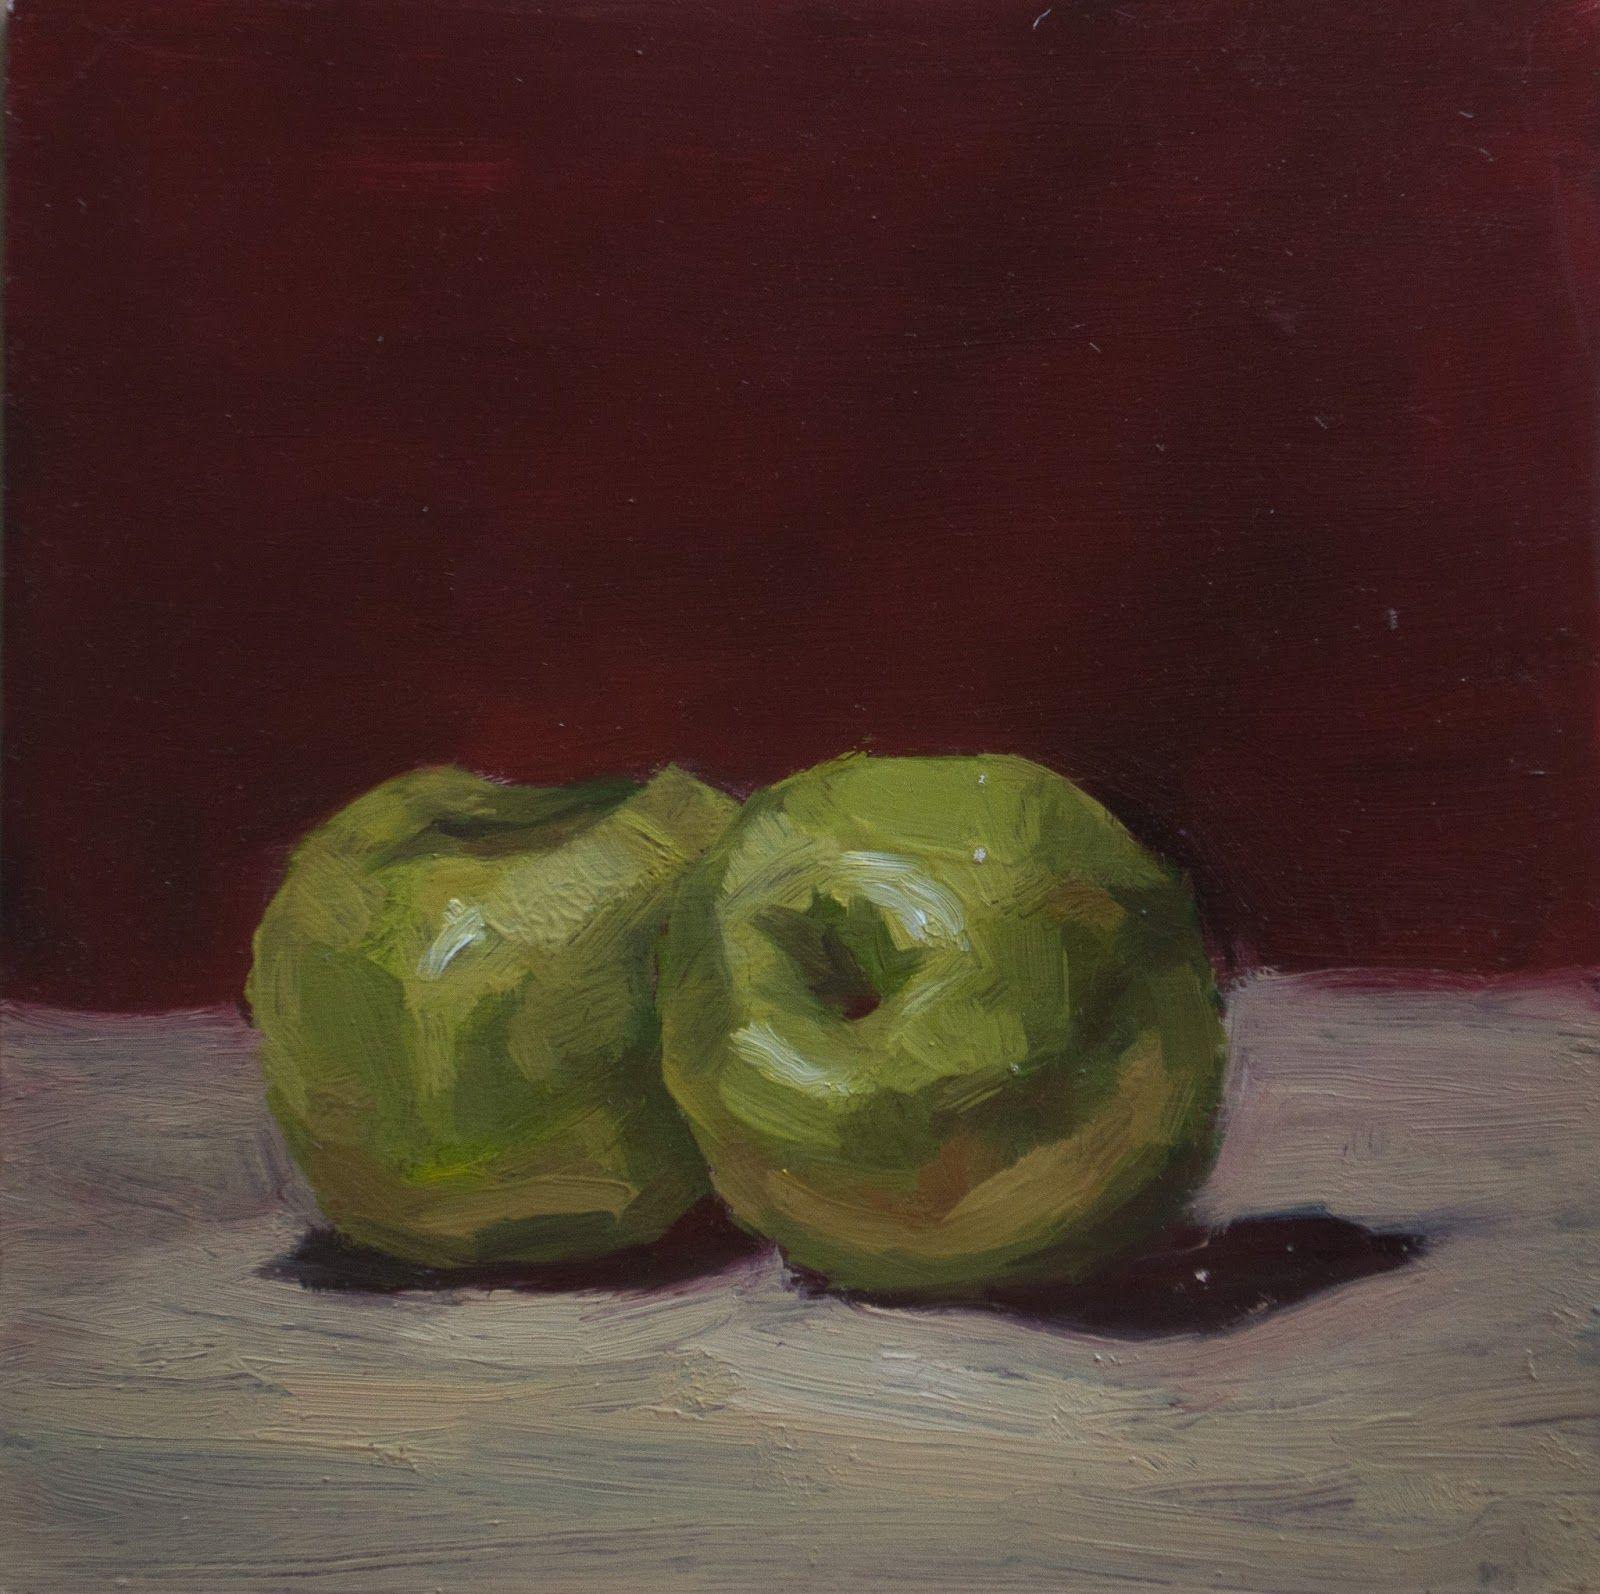 pintura diaria (daily painting)